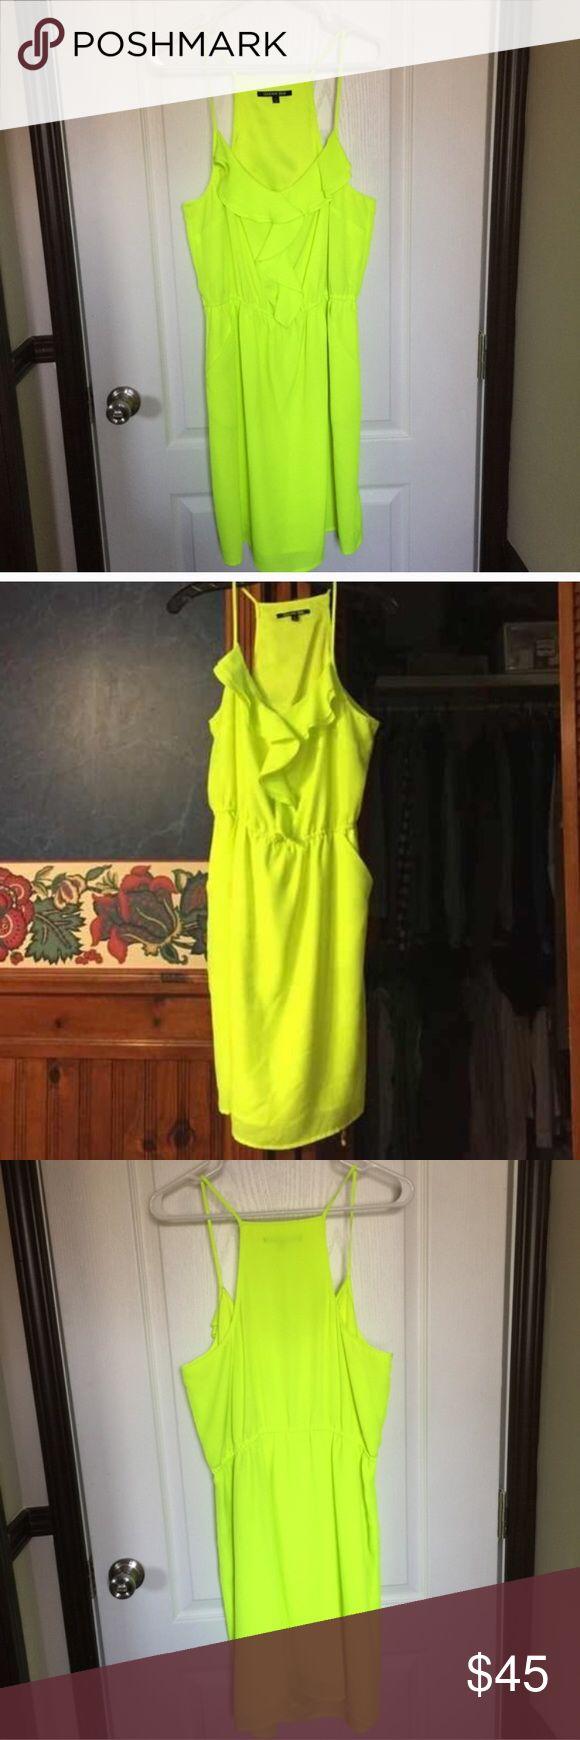 Gianni Bini neon yellow dress Neon yellow dress with two side pockets! Worn once. Gianni Bini Dresses Mini